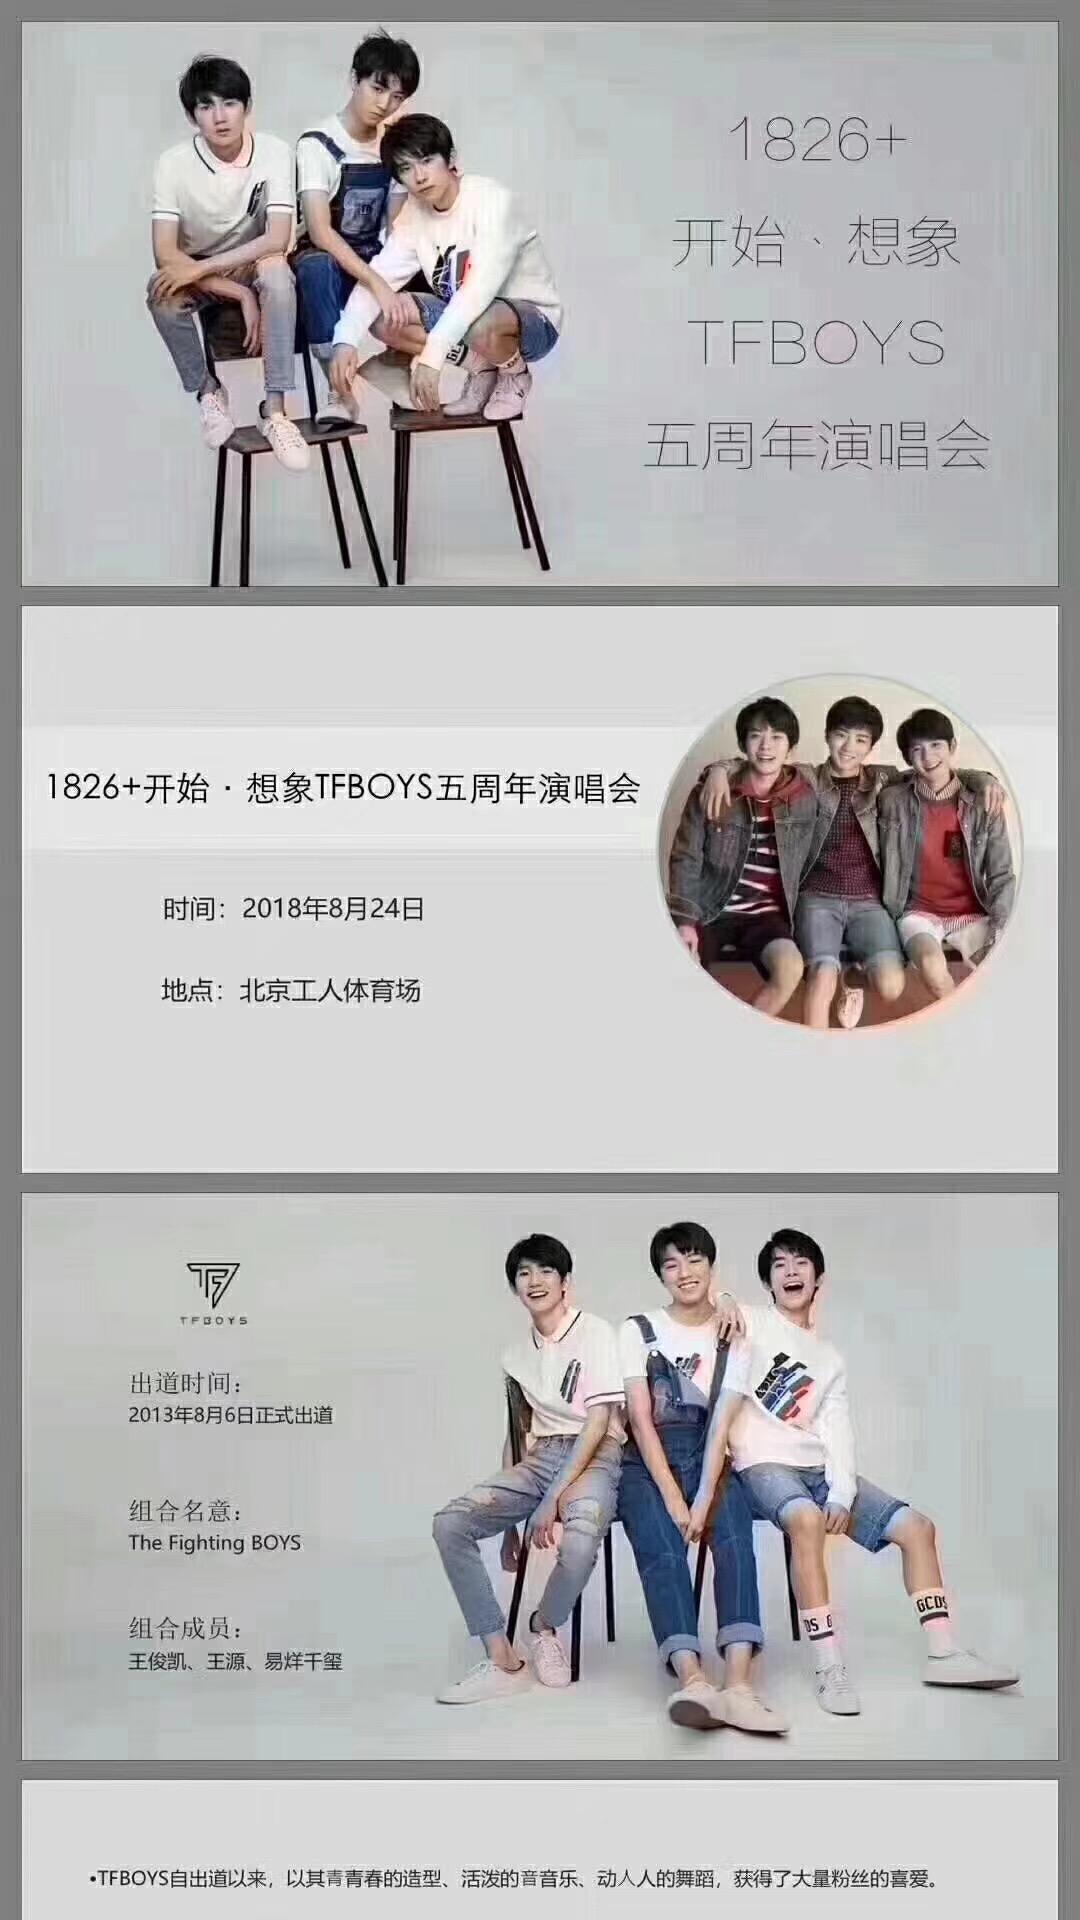 "TFBOYS介绍: TFBOYS是北京时代峰峻文化艺术发展有限公司推出的少年偶像组合,由王俊凯、王源和易烊千玺组成,2013年8月6日正式出道,2013年10月18日发行出道EP《Heart梦·出发》。 2014年3月13日,发行单曲《魔法城堡》。4月15日,荣获第二届音悦V榜年度盛典""内地最具人气歌手奖""和""音悦直播人气歌手奖""。8月3日,举行出道一周年粉丝答谢会;16日,单曲《青春修炼手册》MV上线,破5项V榜吉尼斯,夺取内地音乐榜冠军宝"